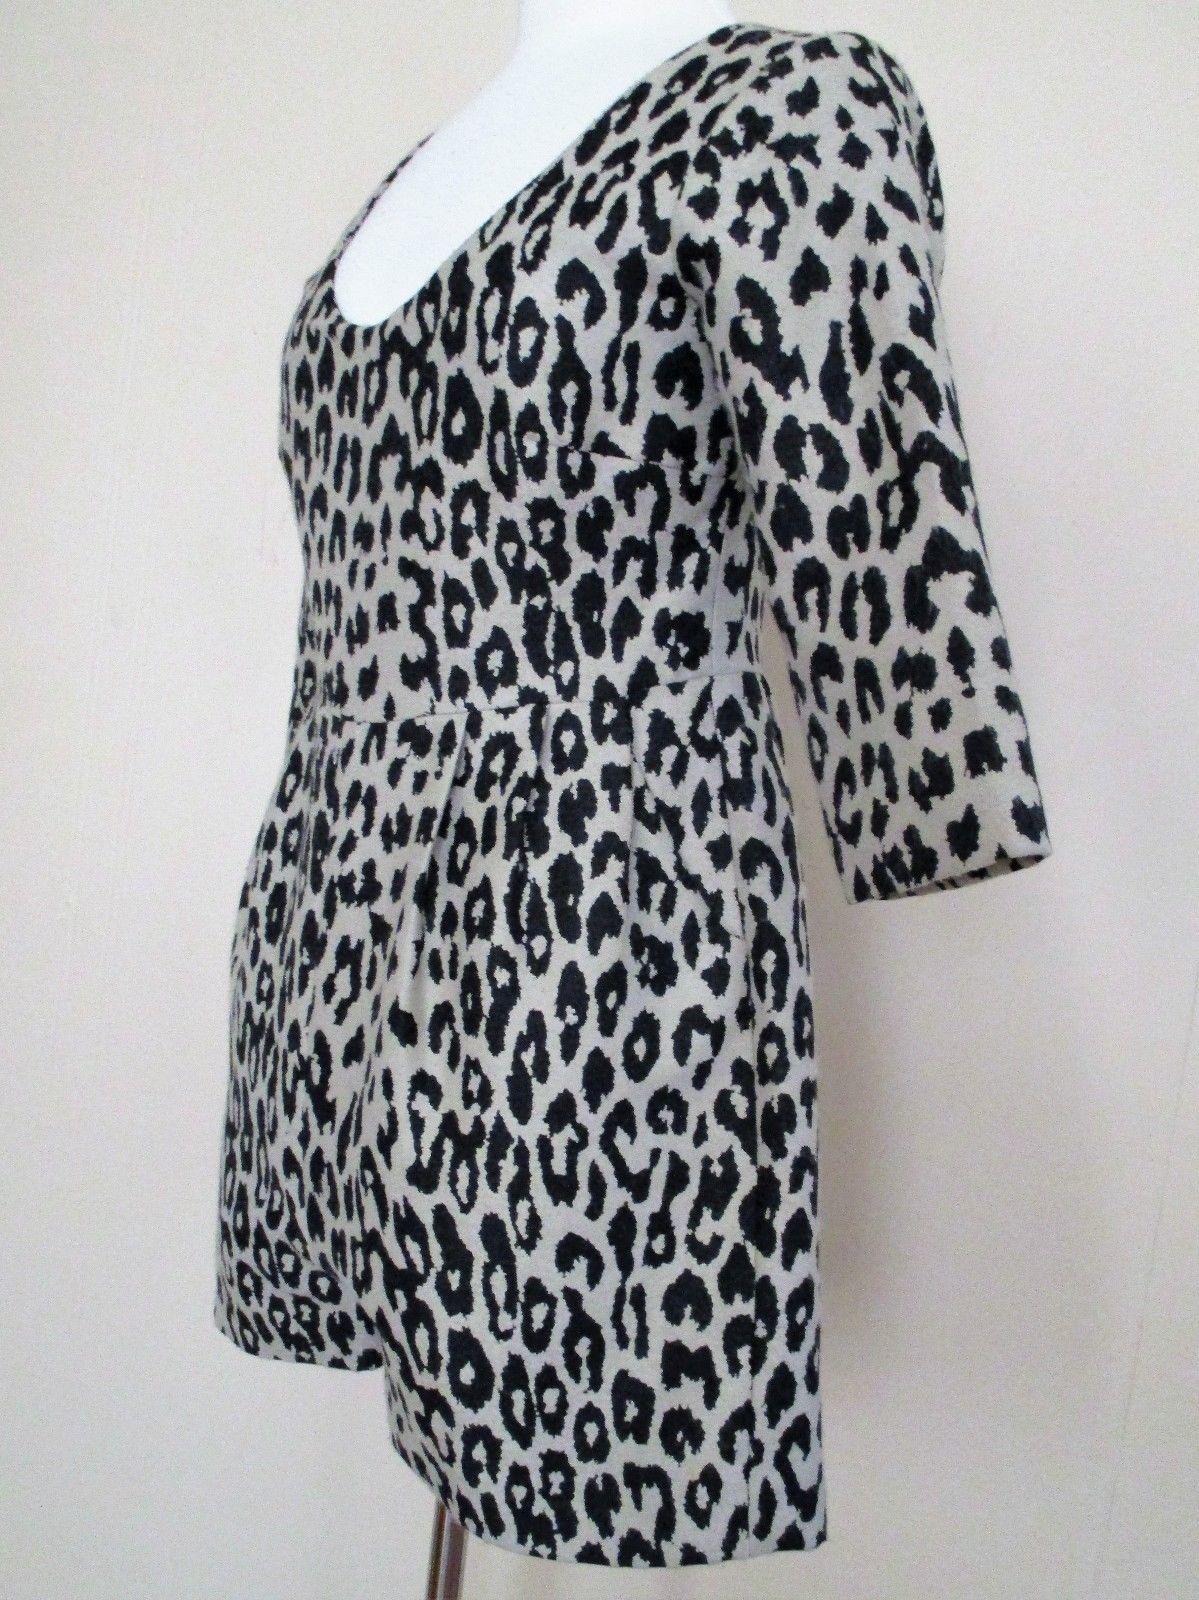 Loeffler Randall Romper Small Women leopard print wool blend 3/4 sleeve